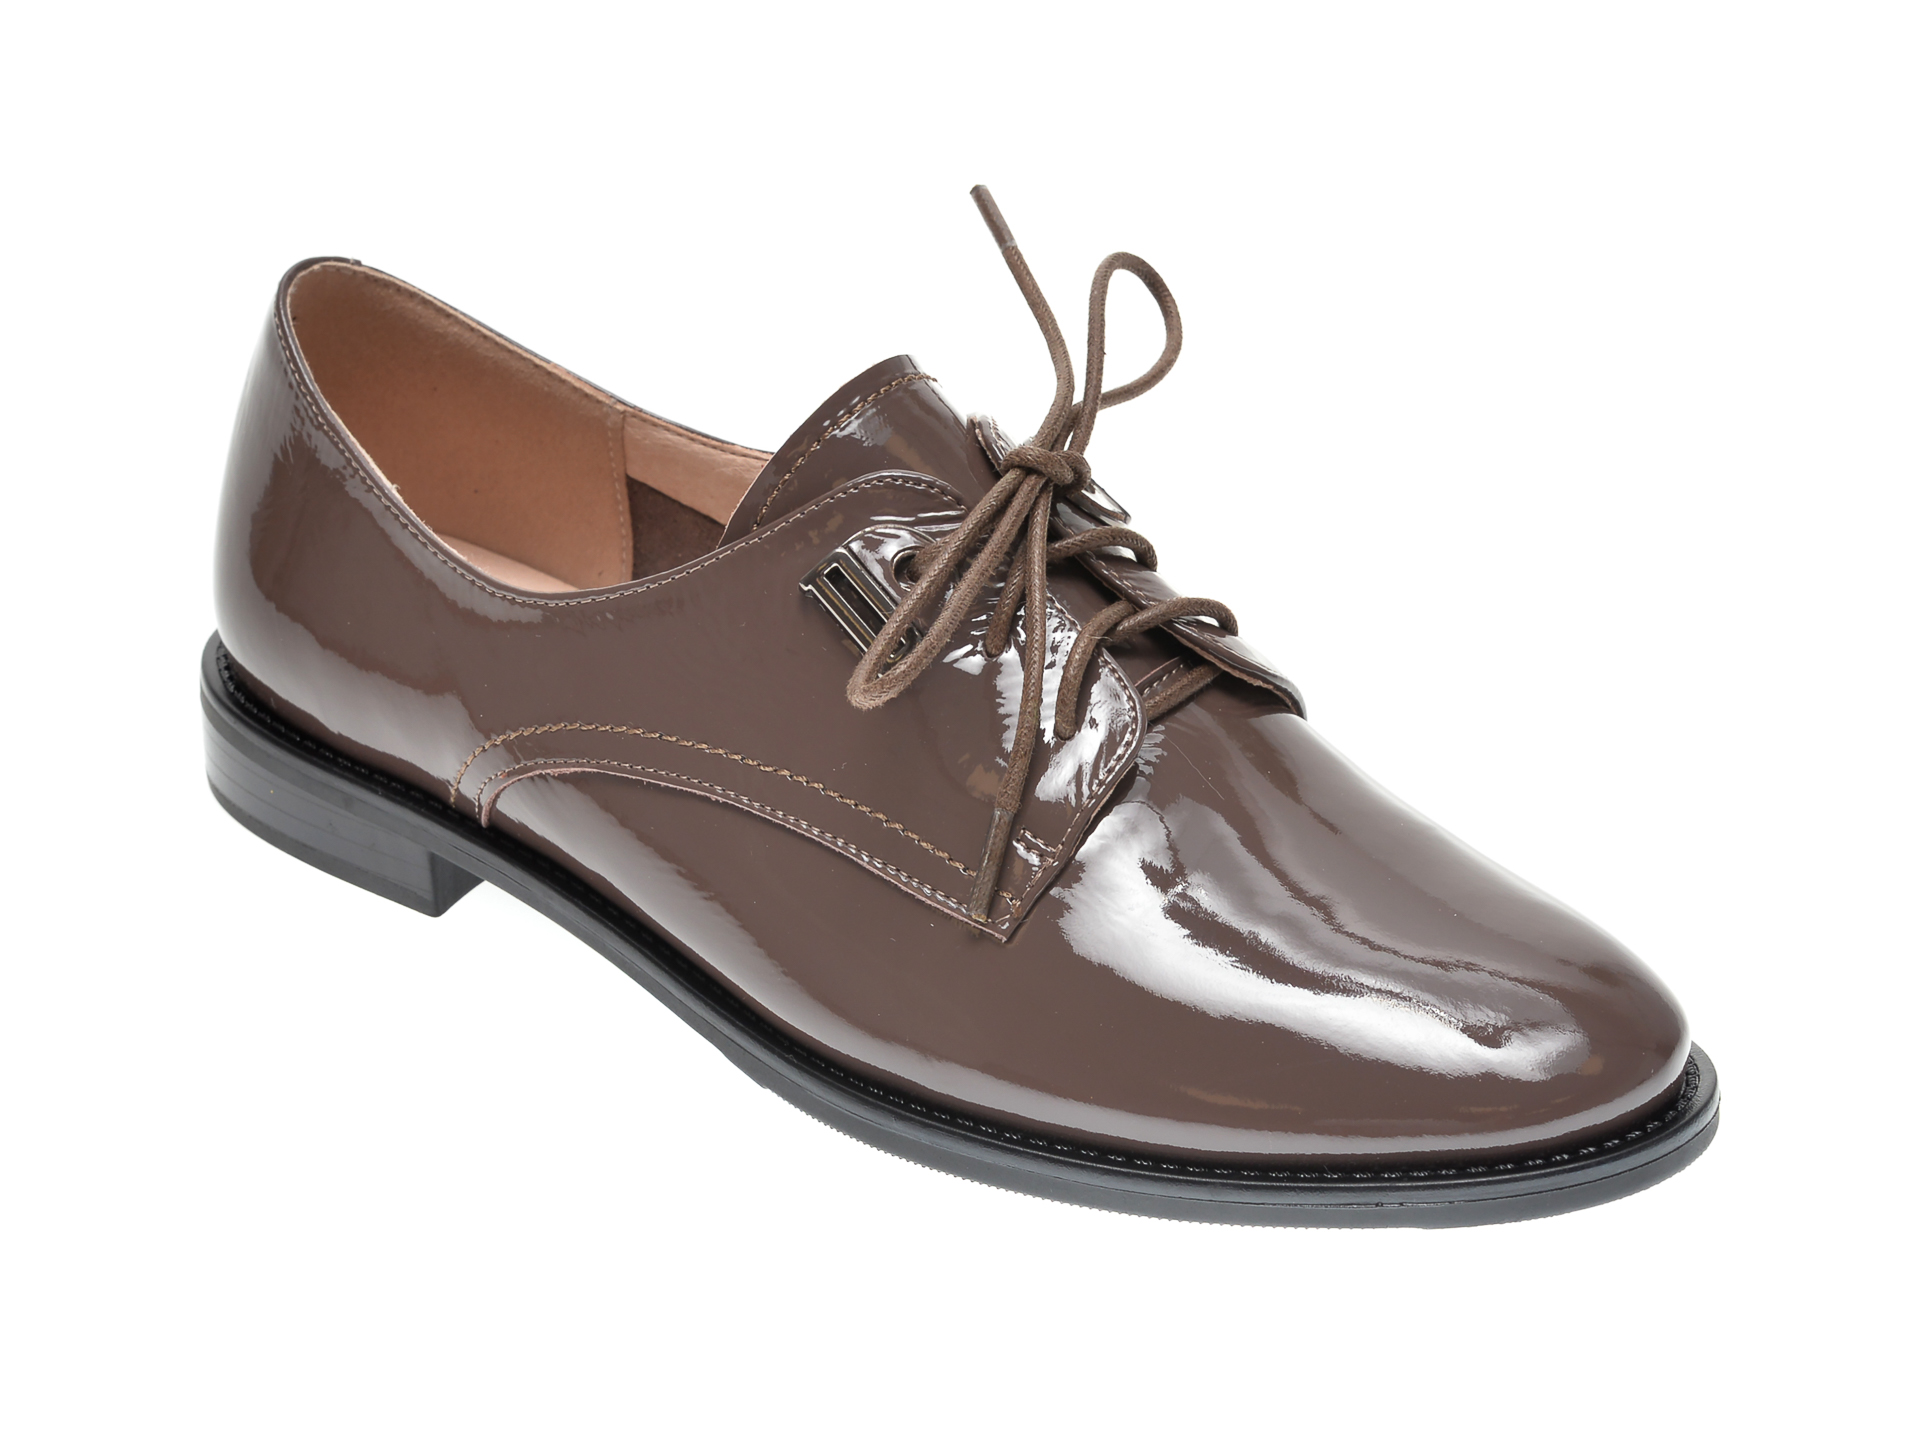 Pantofi KARISMA gri, H665301, din piele naturala lacuita